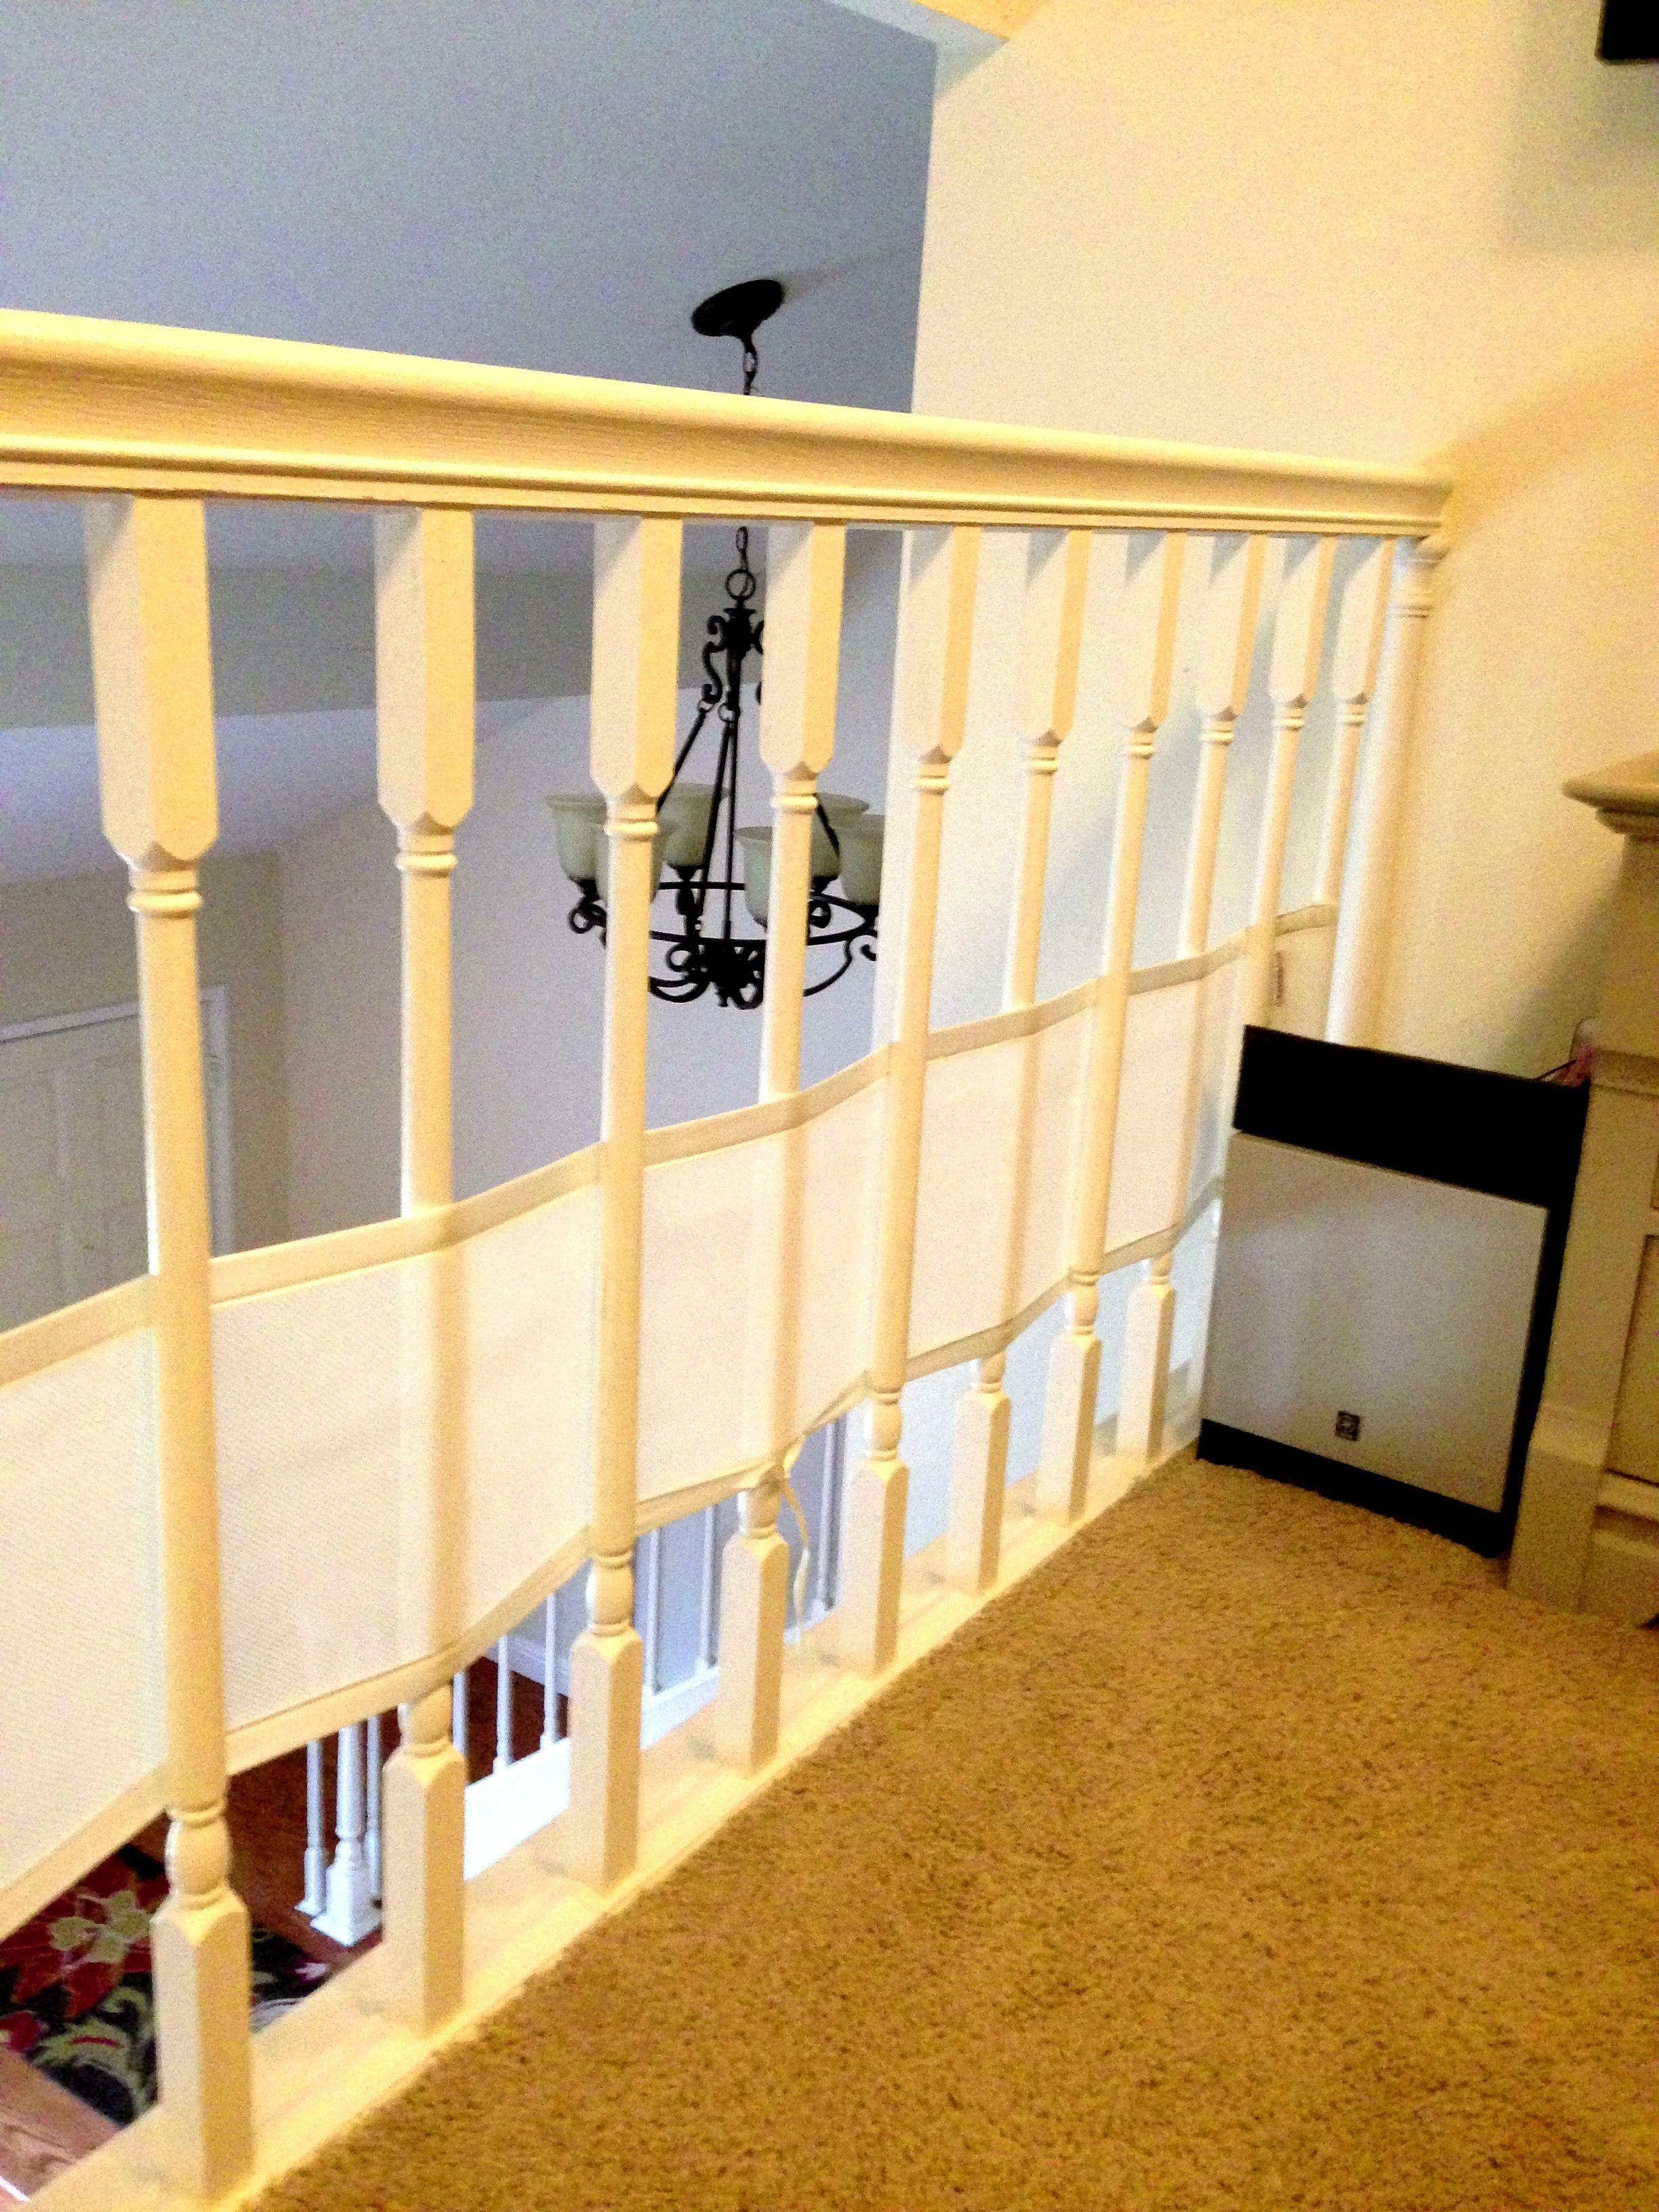 Repurpose breathable crib bumpers. Wide railing. Crib